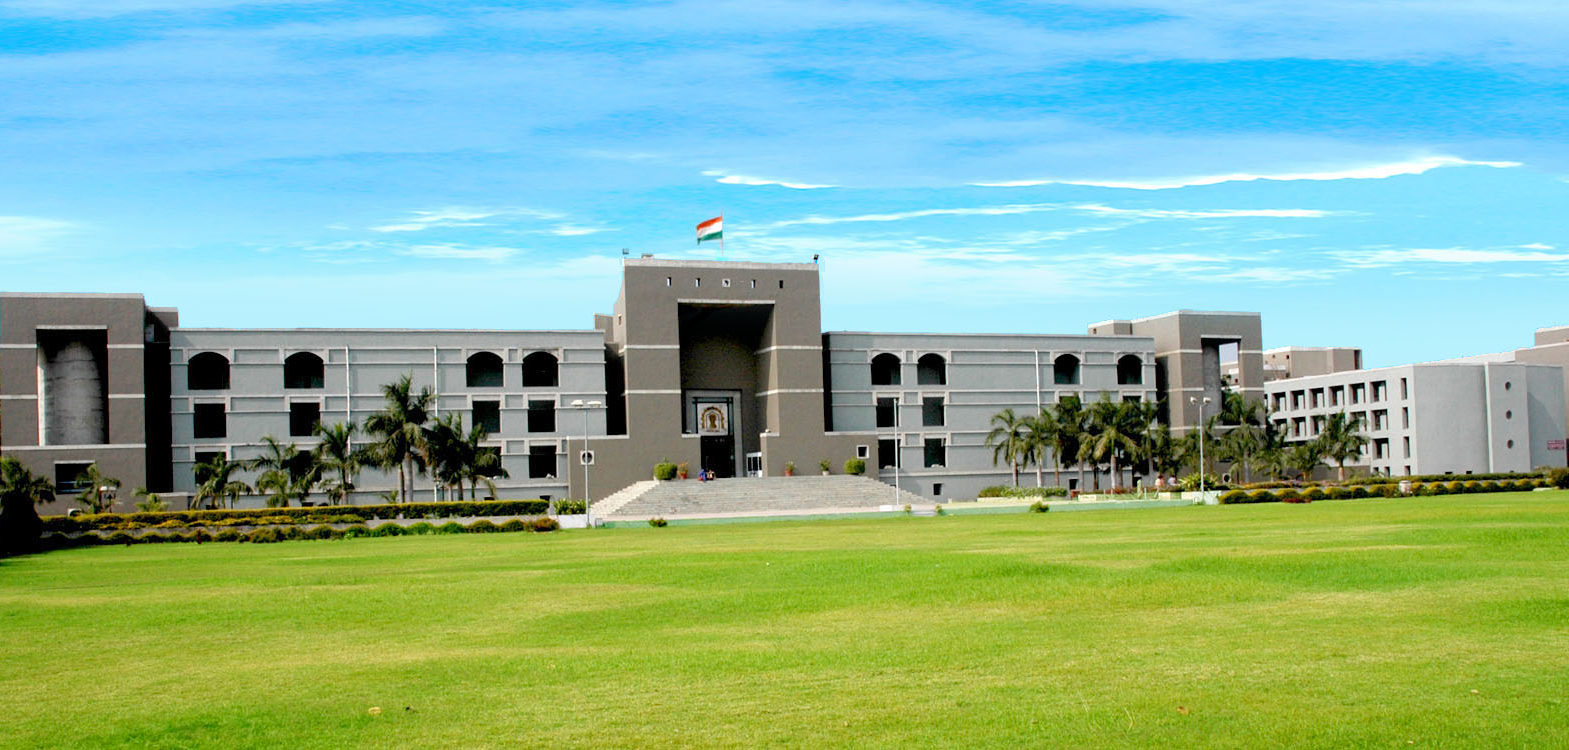 Gujarat High Court - Wikipedia